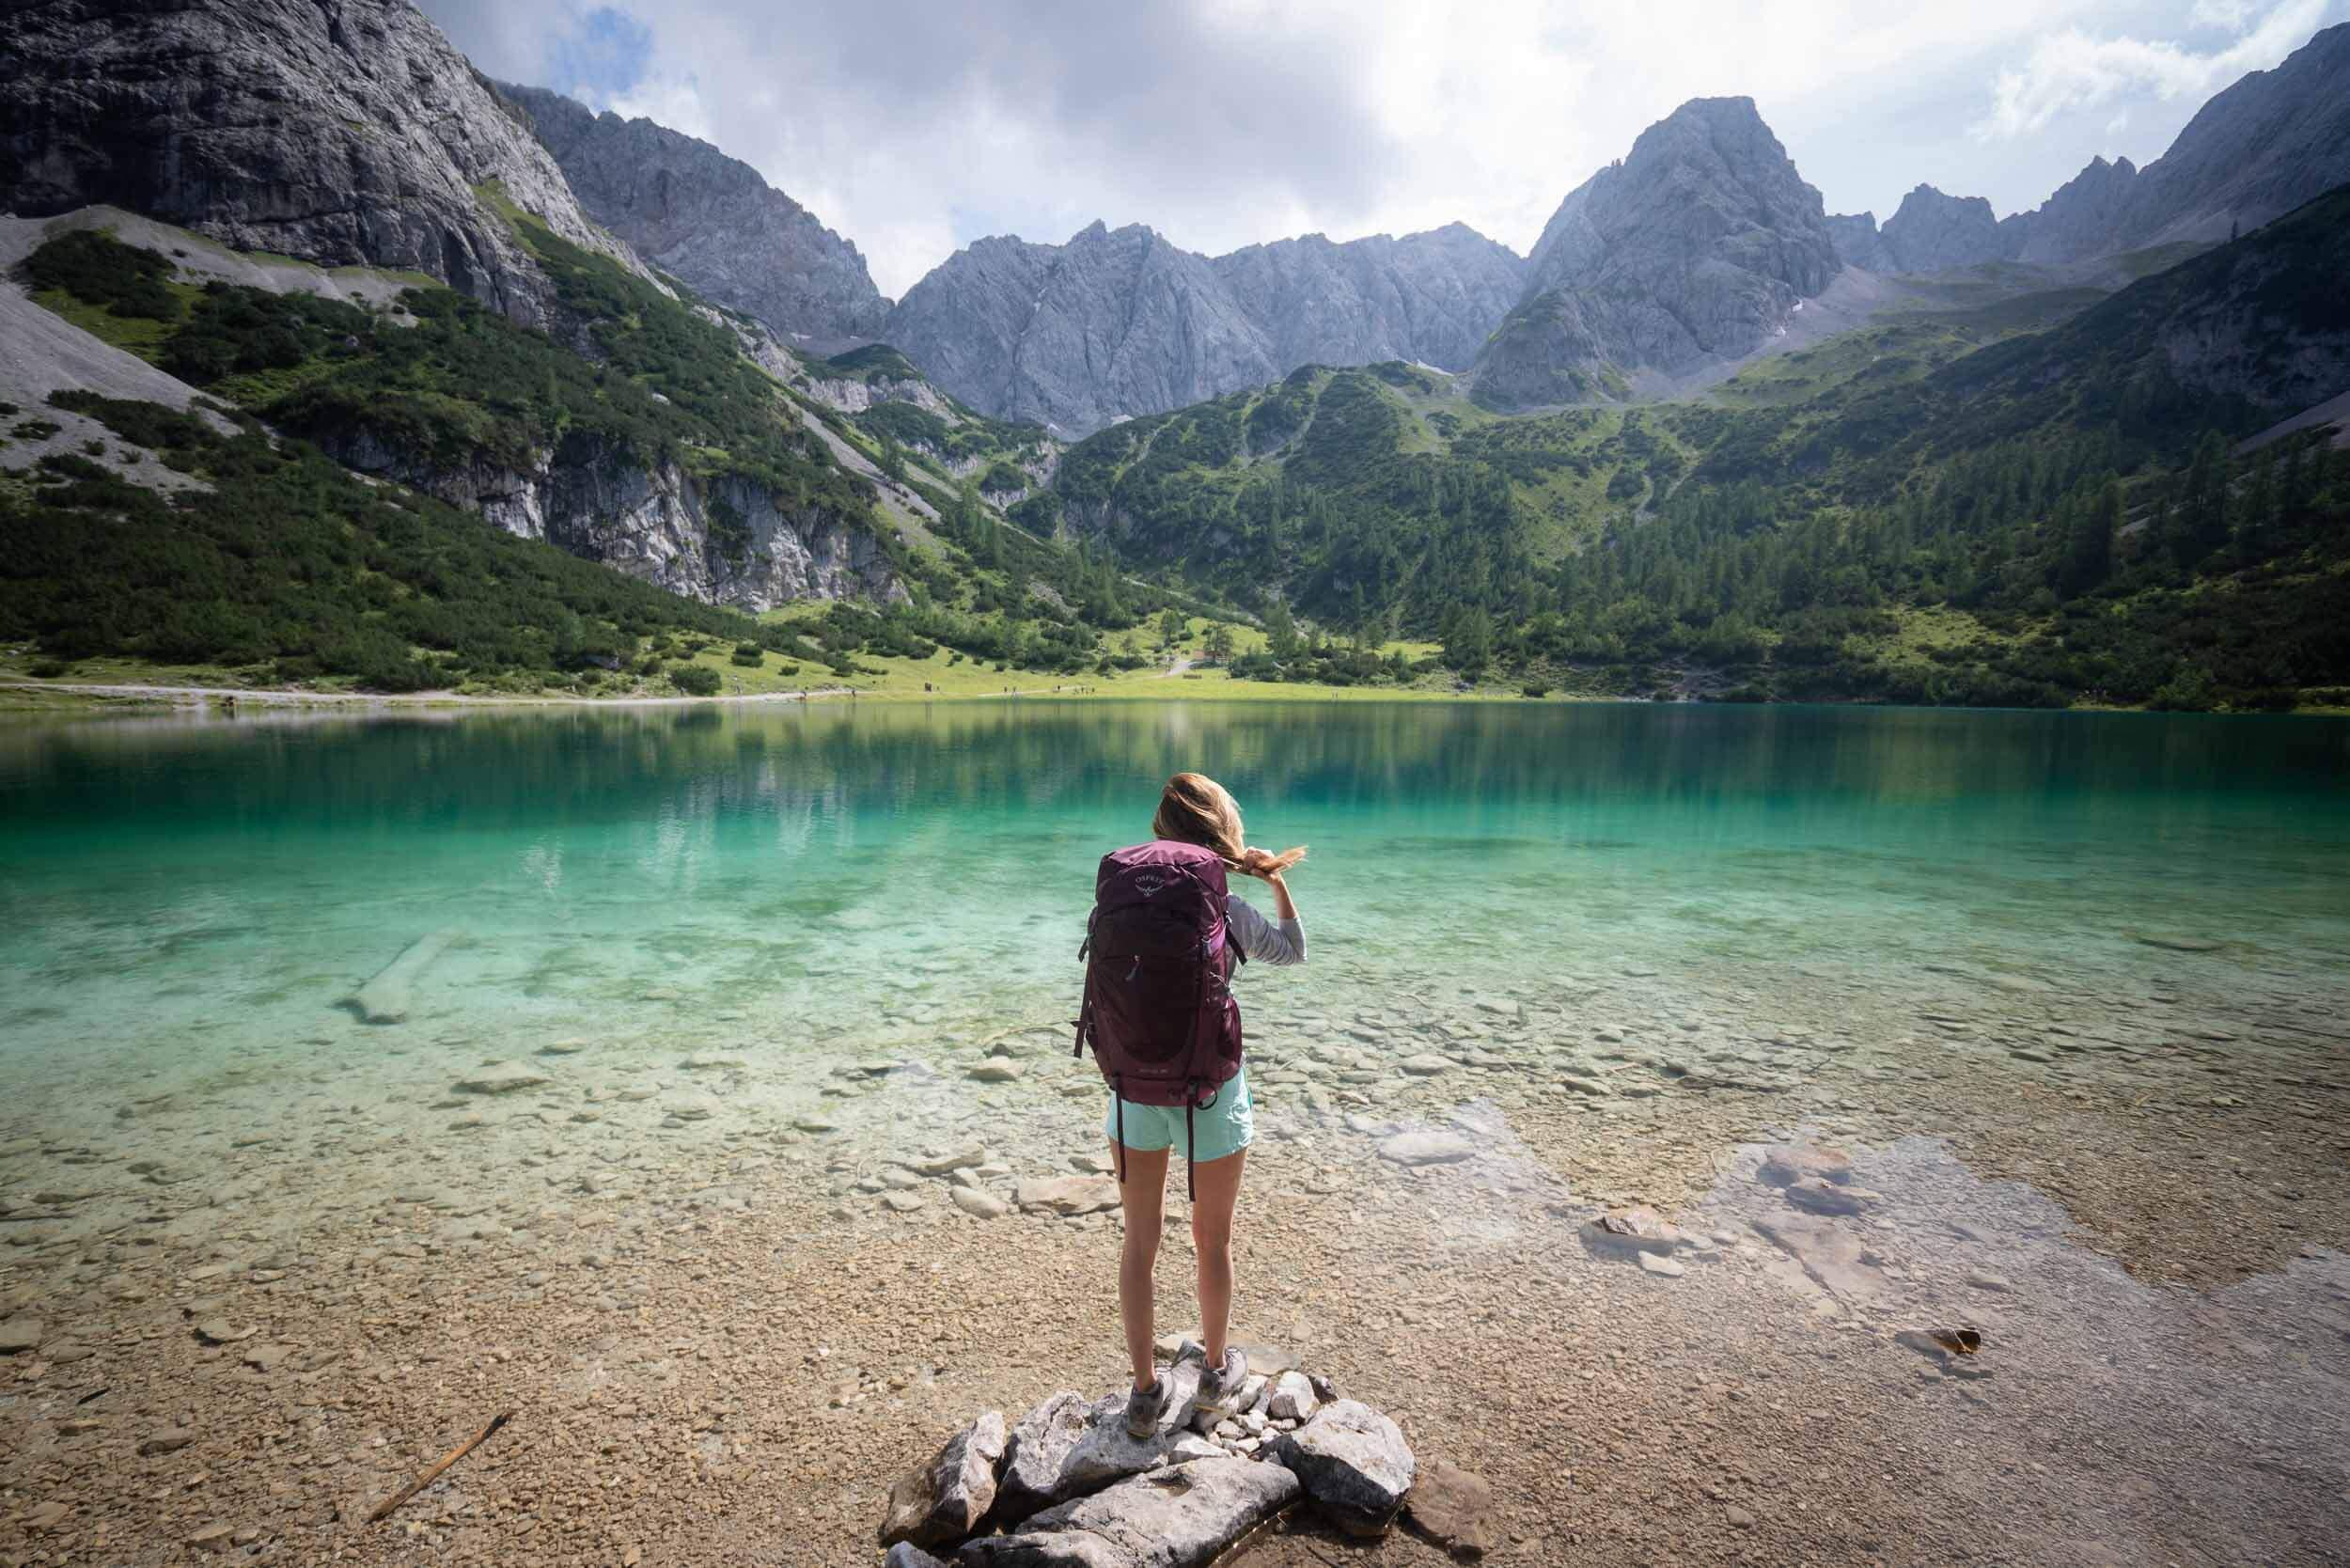 Seebensee Lake in Austria